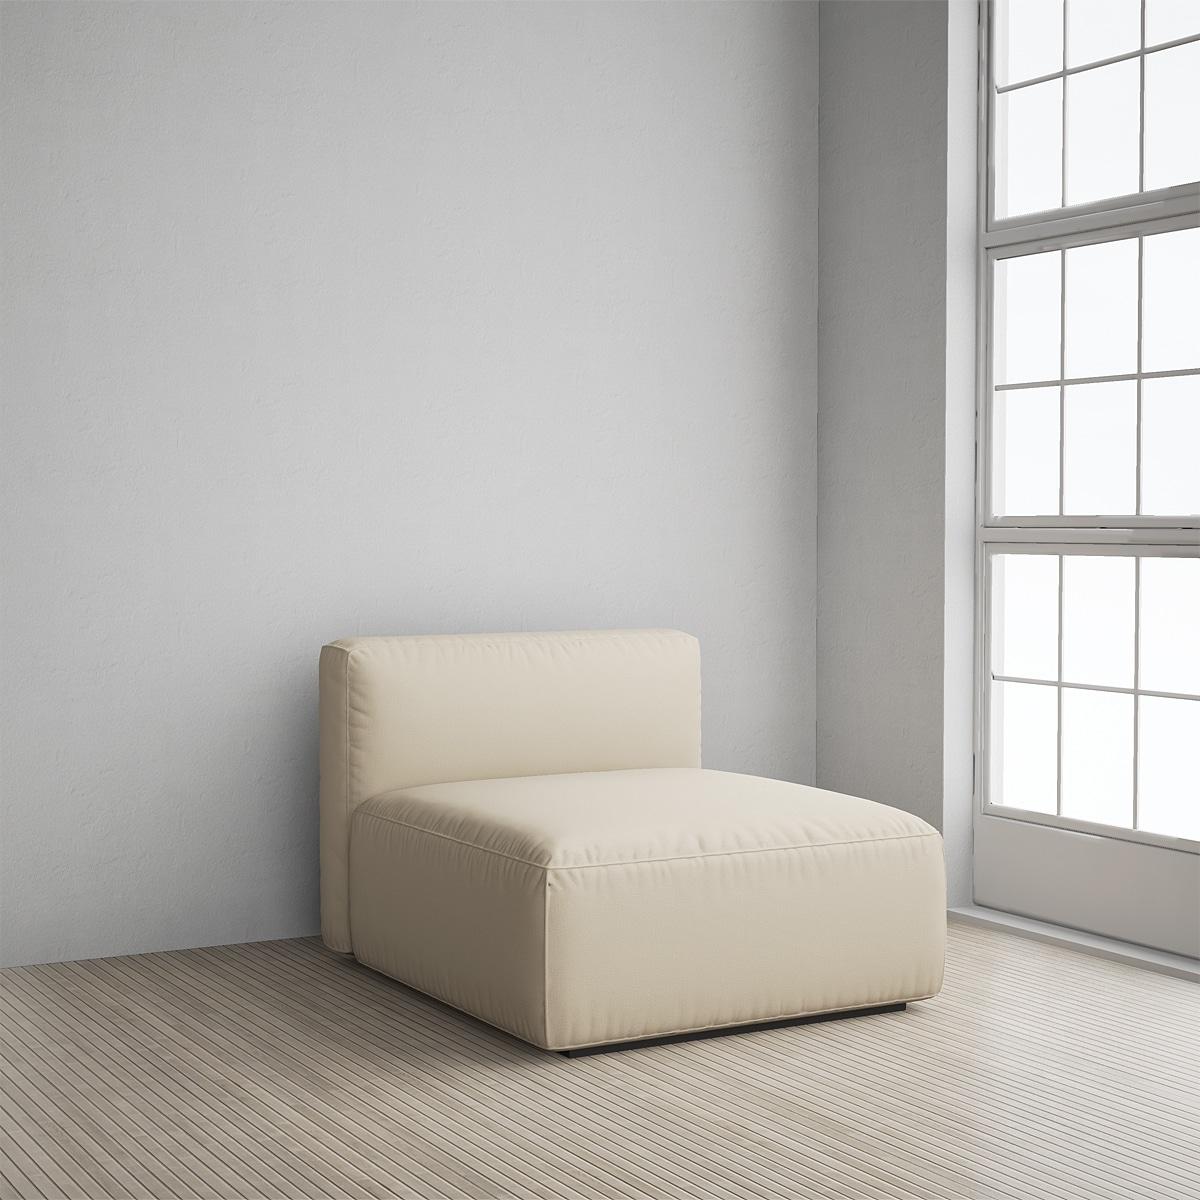 cassina mex cube sofa module 04 ue4arch. Black Bedroom Furniture Sets. Home Design Ideas